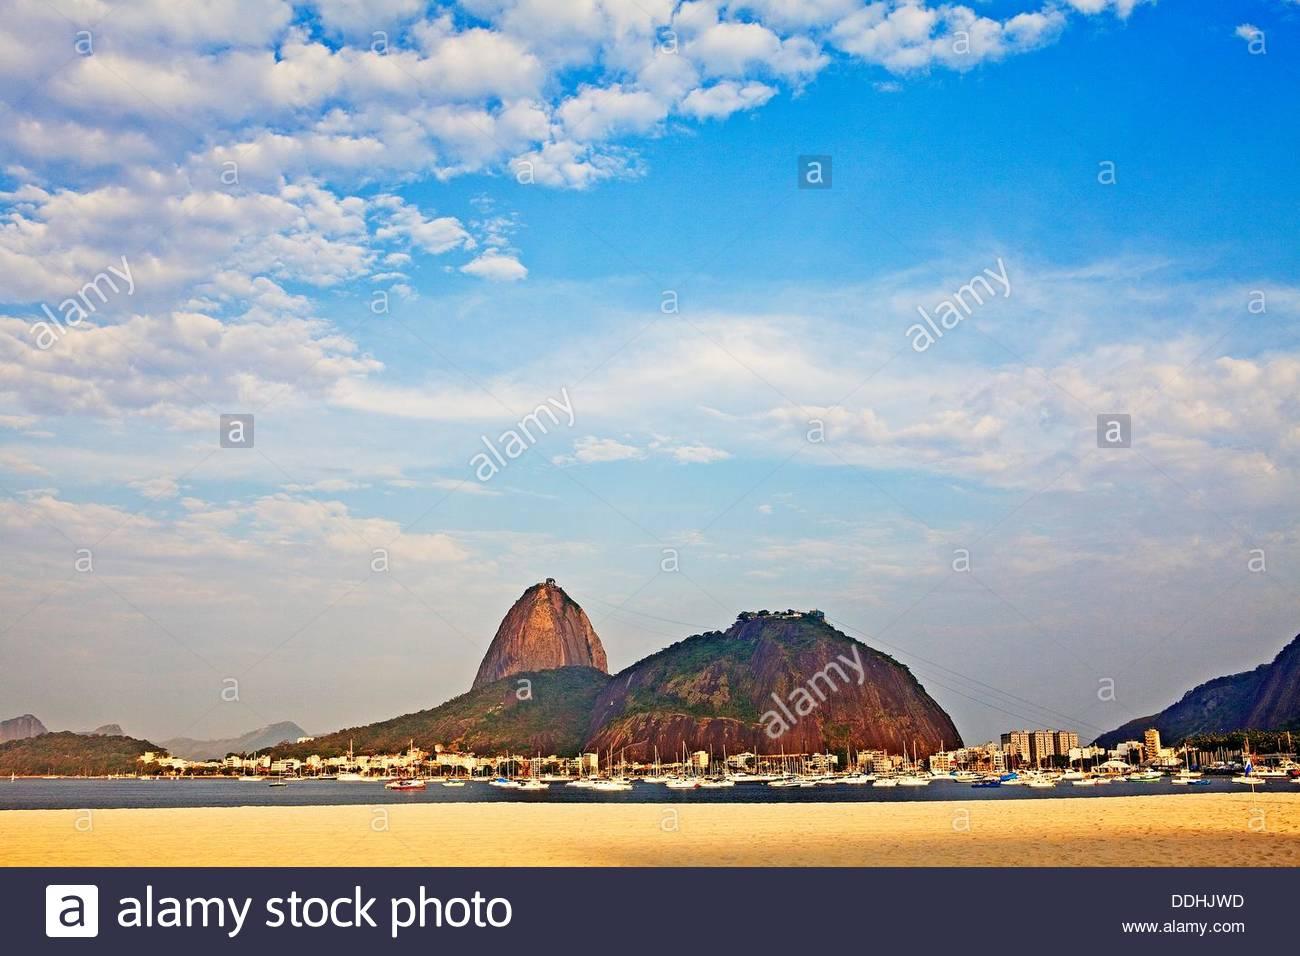 Brasilien, Rio De Janeiro Botafogo, Blick auf Zuckerhut Stockfoto, Bild: 60009641 - Alamy